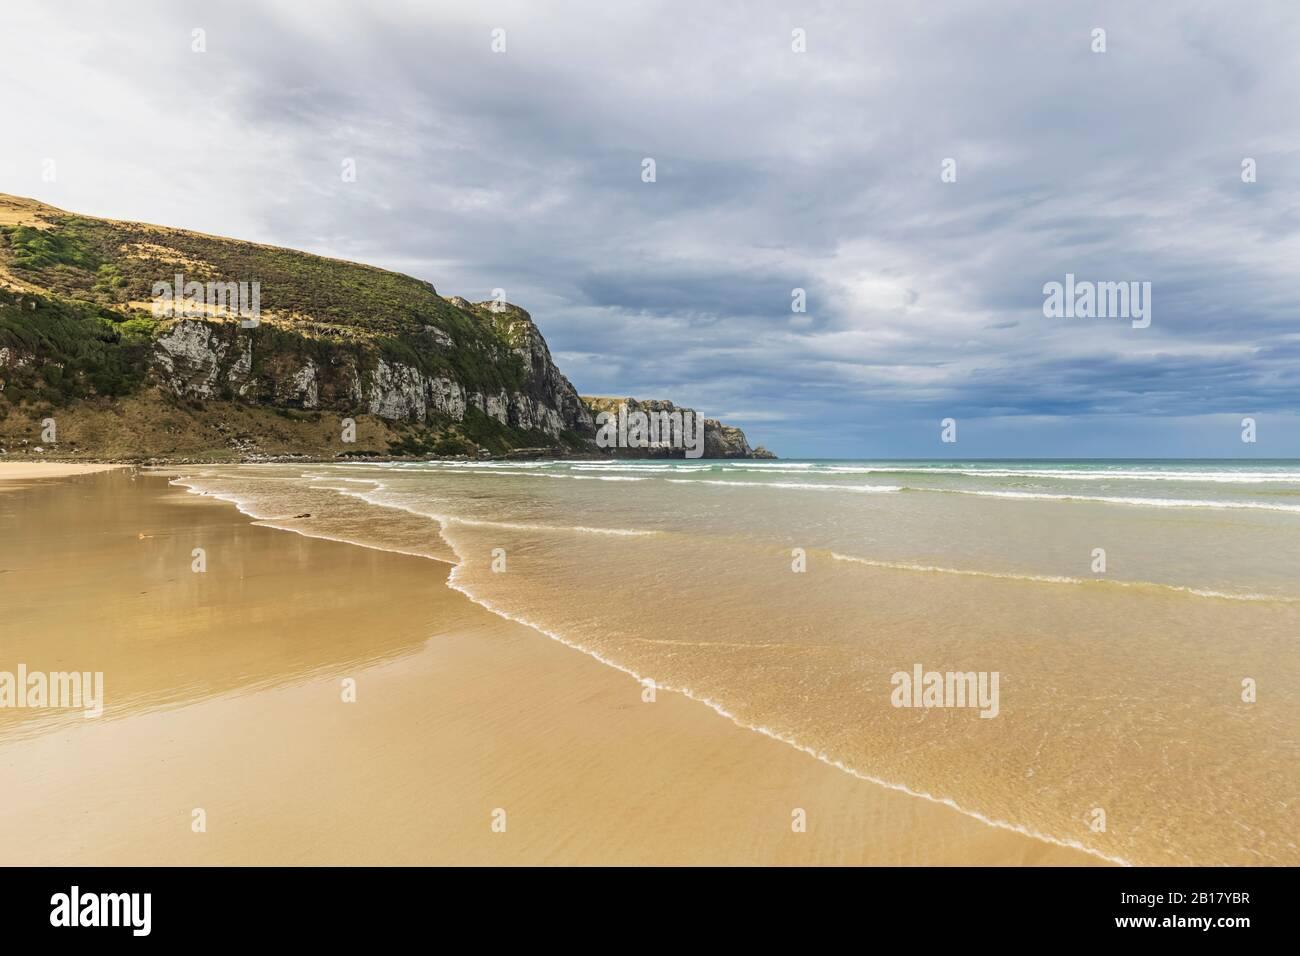 New Zealand, Cloudy sky over sandy coastal beach of Purakaunui Bay Stock Photo